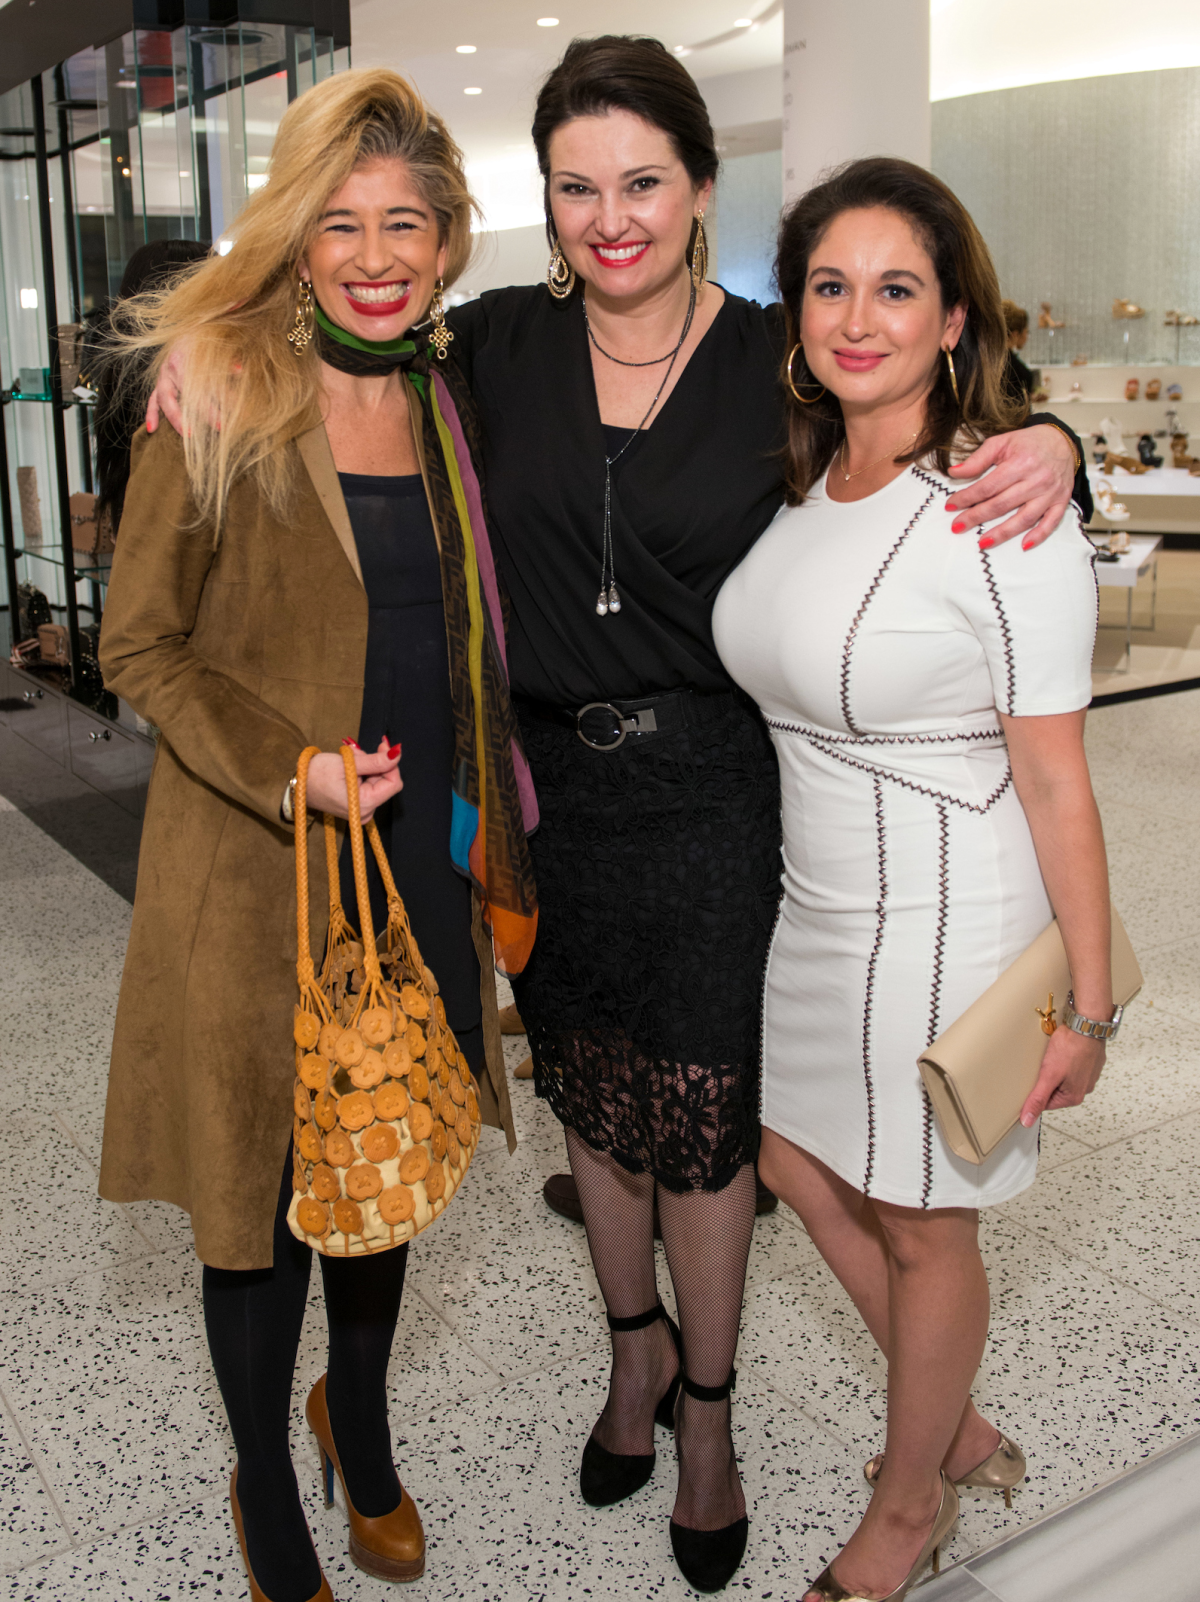 Houston, Latin Women's Initiative Fashion Show and Luncheon, feb 2017, Sofia Androgue, Claudia Lobao, Michelle Fraga